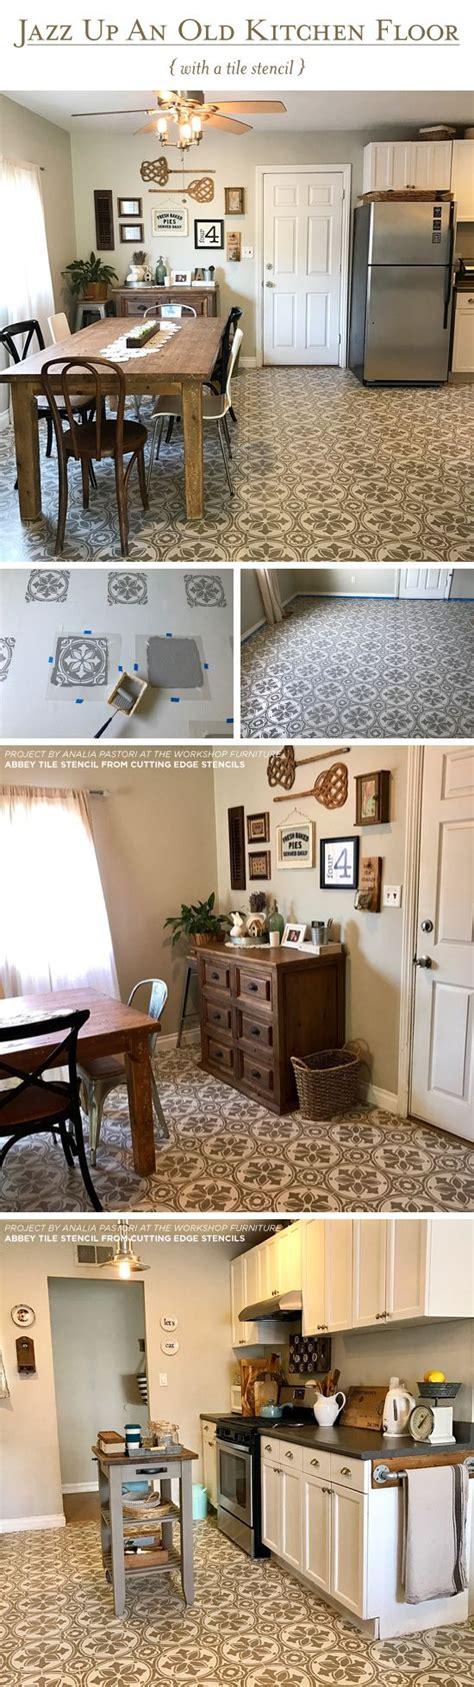 paint linoleum floor kitchen best 25 linoleum kitchen floors ideas on 3948